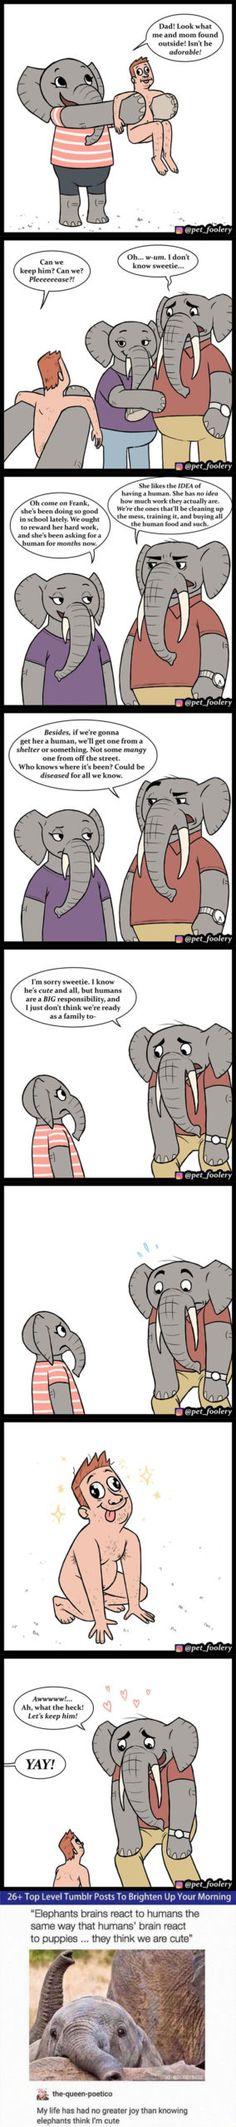 20 Funny Animal Comics By Pet Foolery